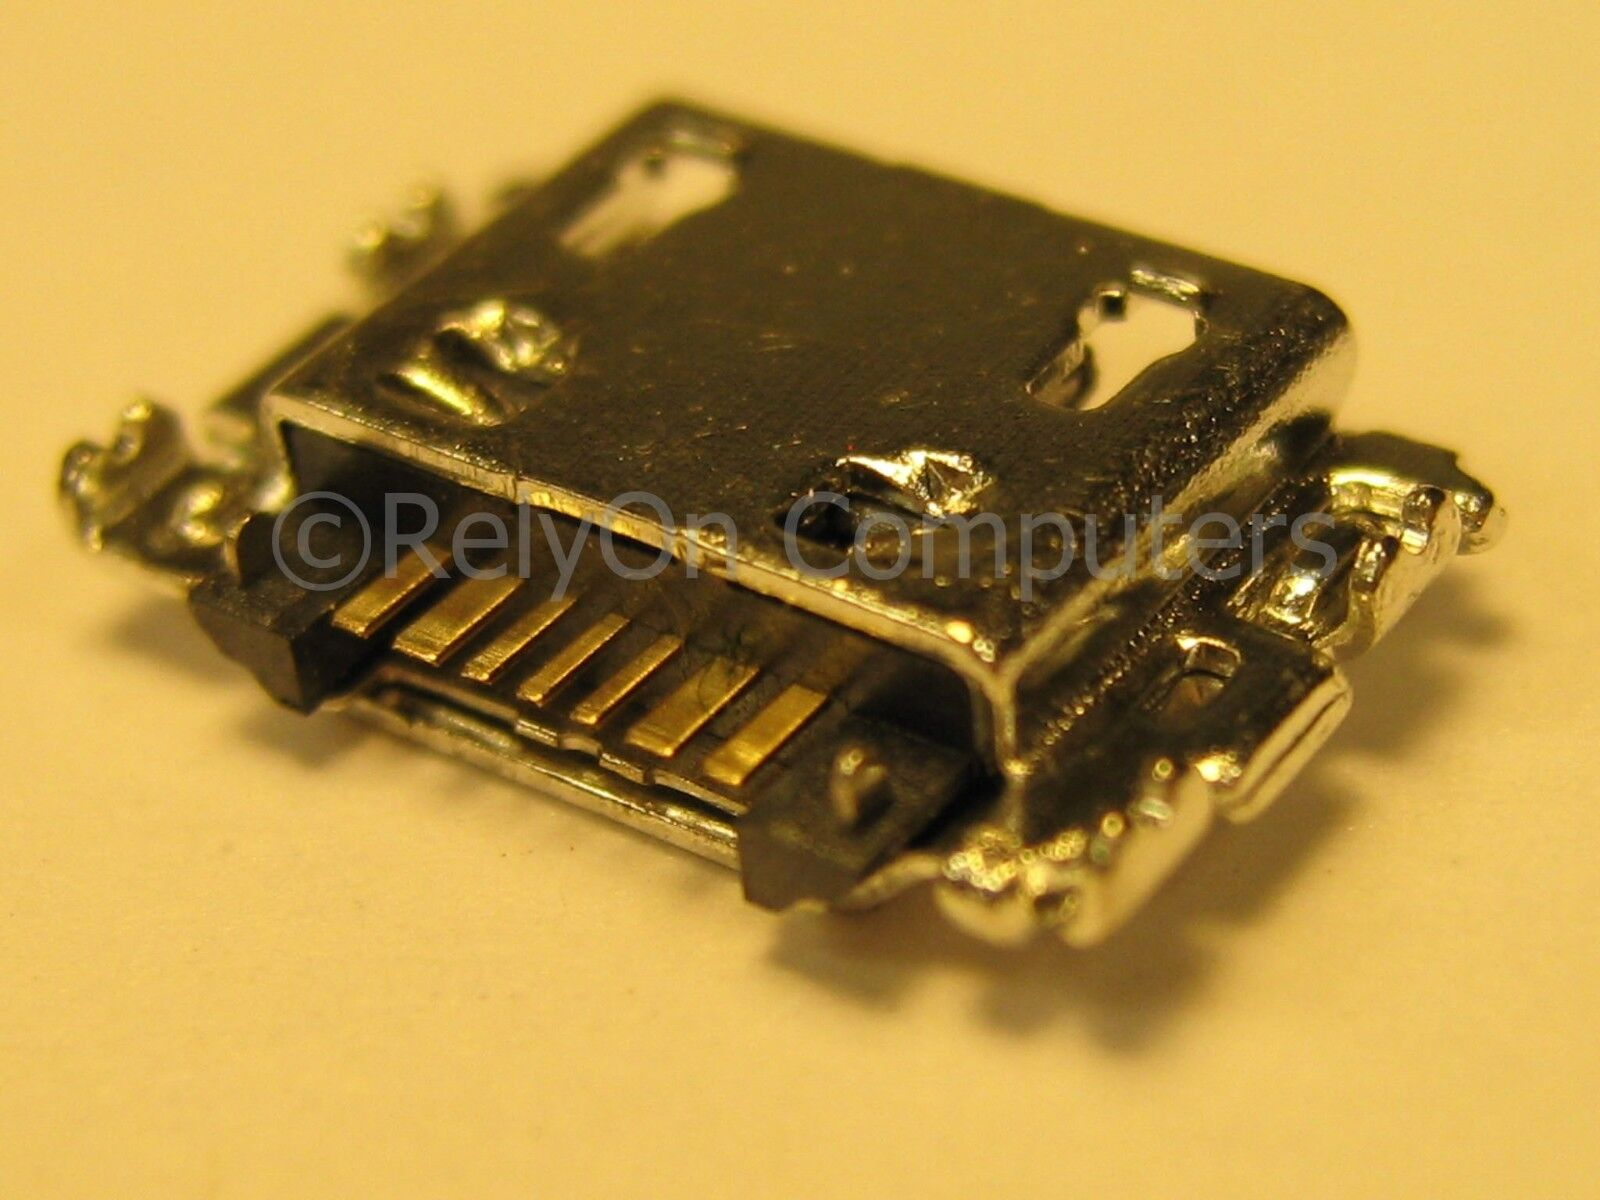 3x Micro USB Charging Port Sync For Samsung Galaxy Tab A 8.0 SM-T350 SM-T350N US